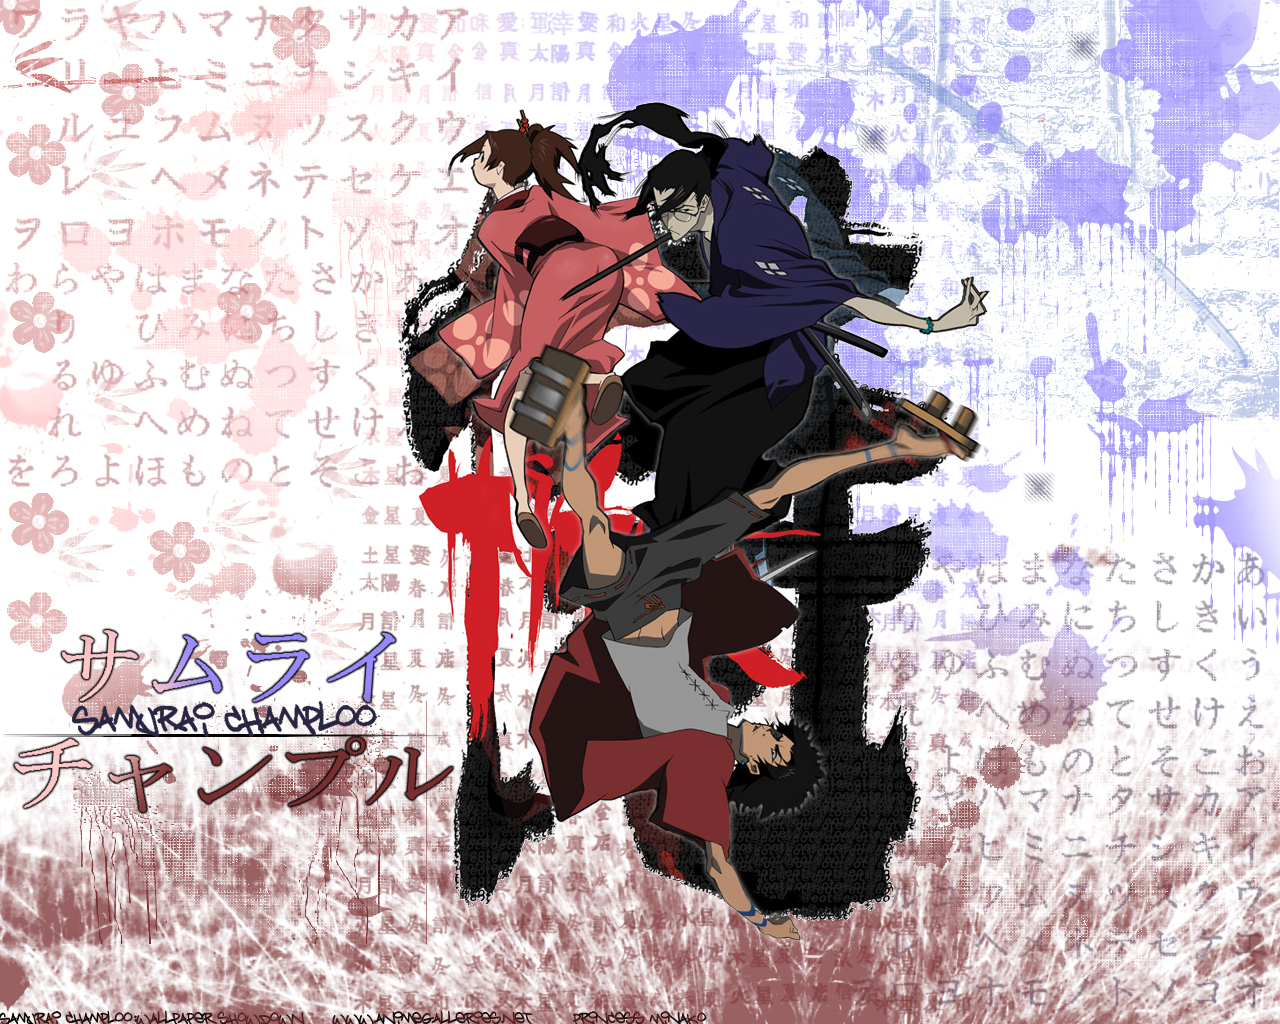 Samurai Champloo Anime Wallpaper # 27